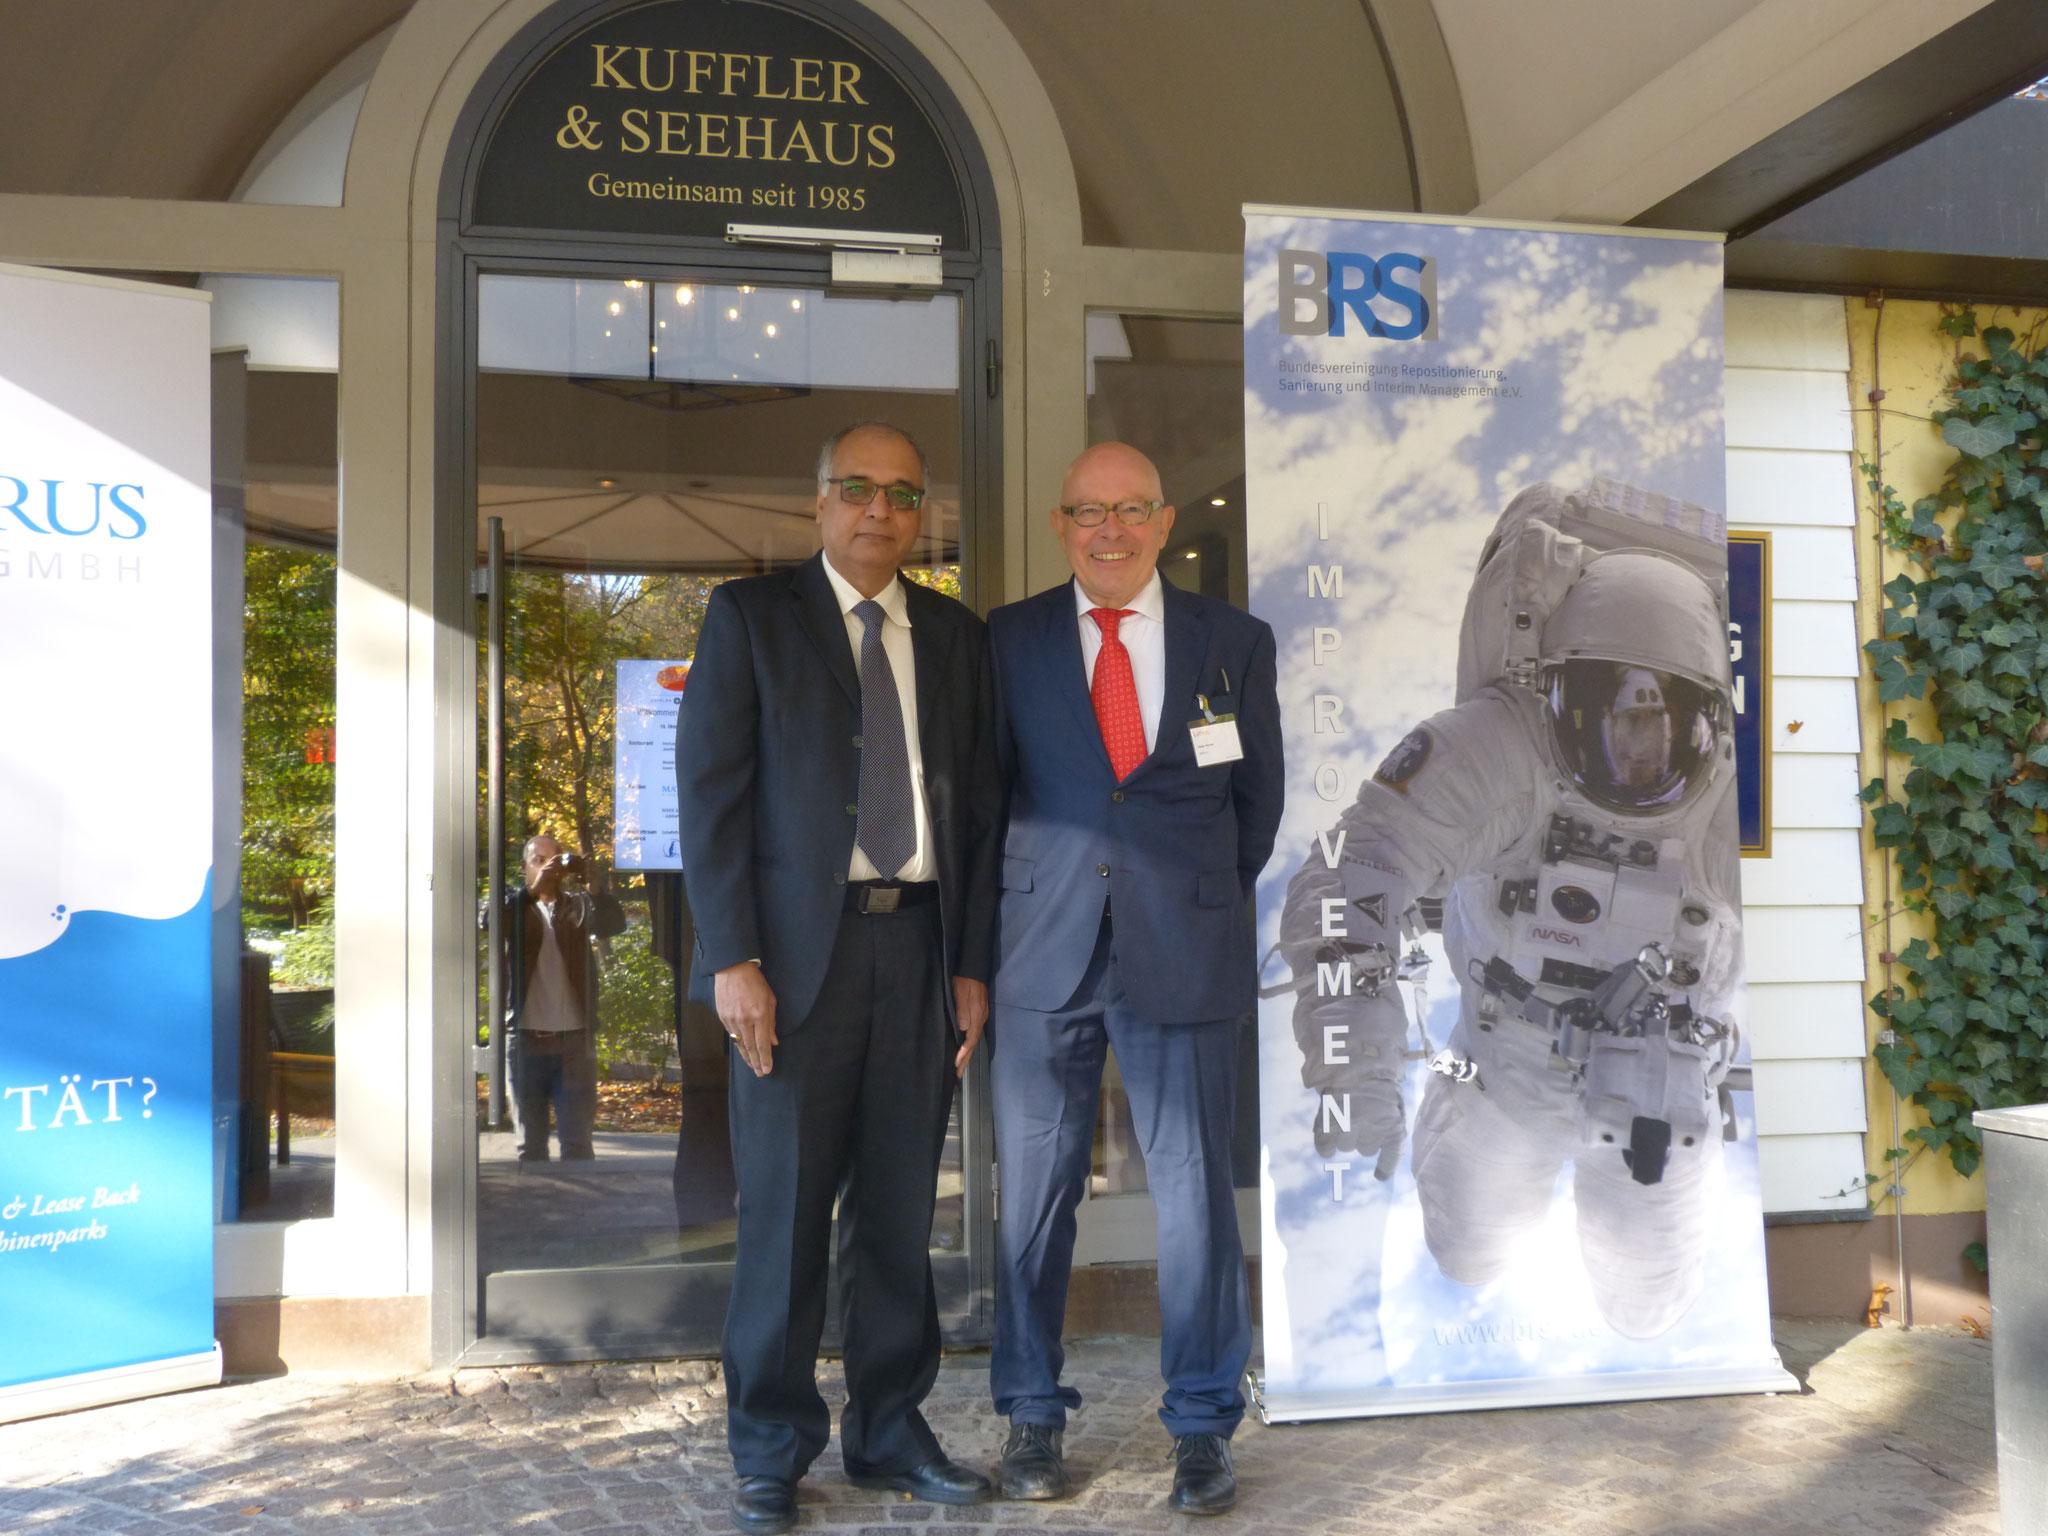 Dr. Tariq (BRSI Direktor Middle East) und Dr. Körner (BRSI Geschäftsführender Vorstand)